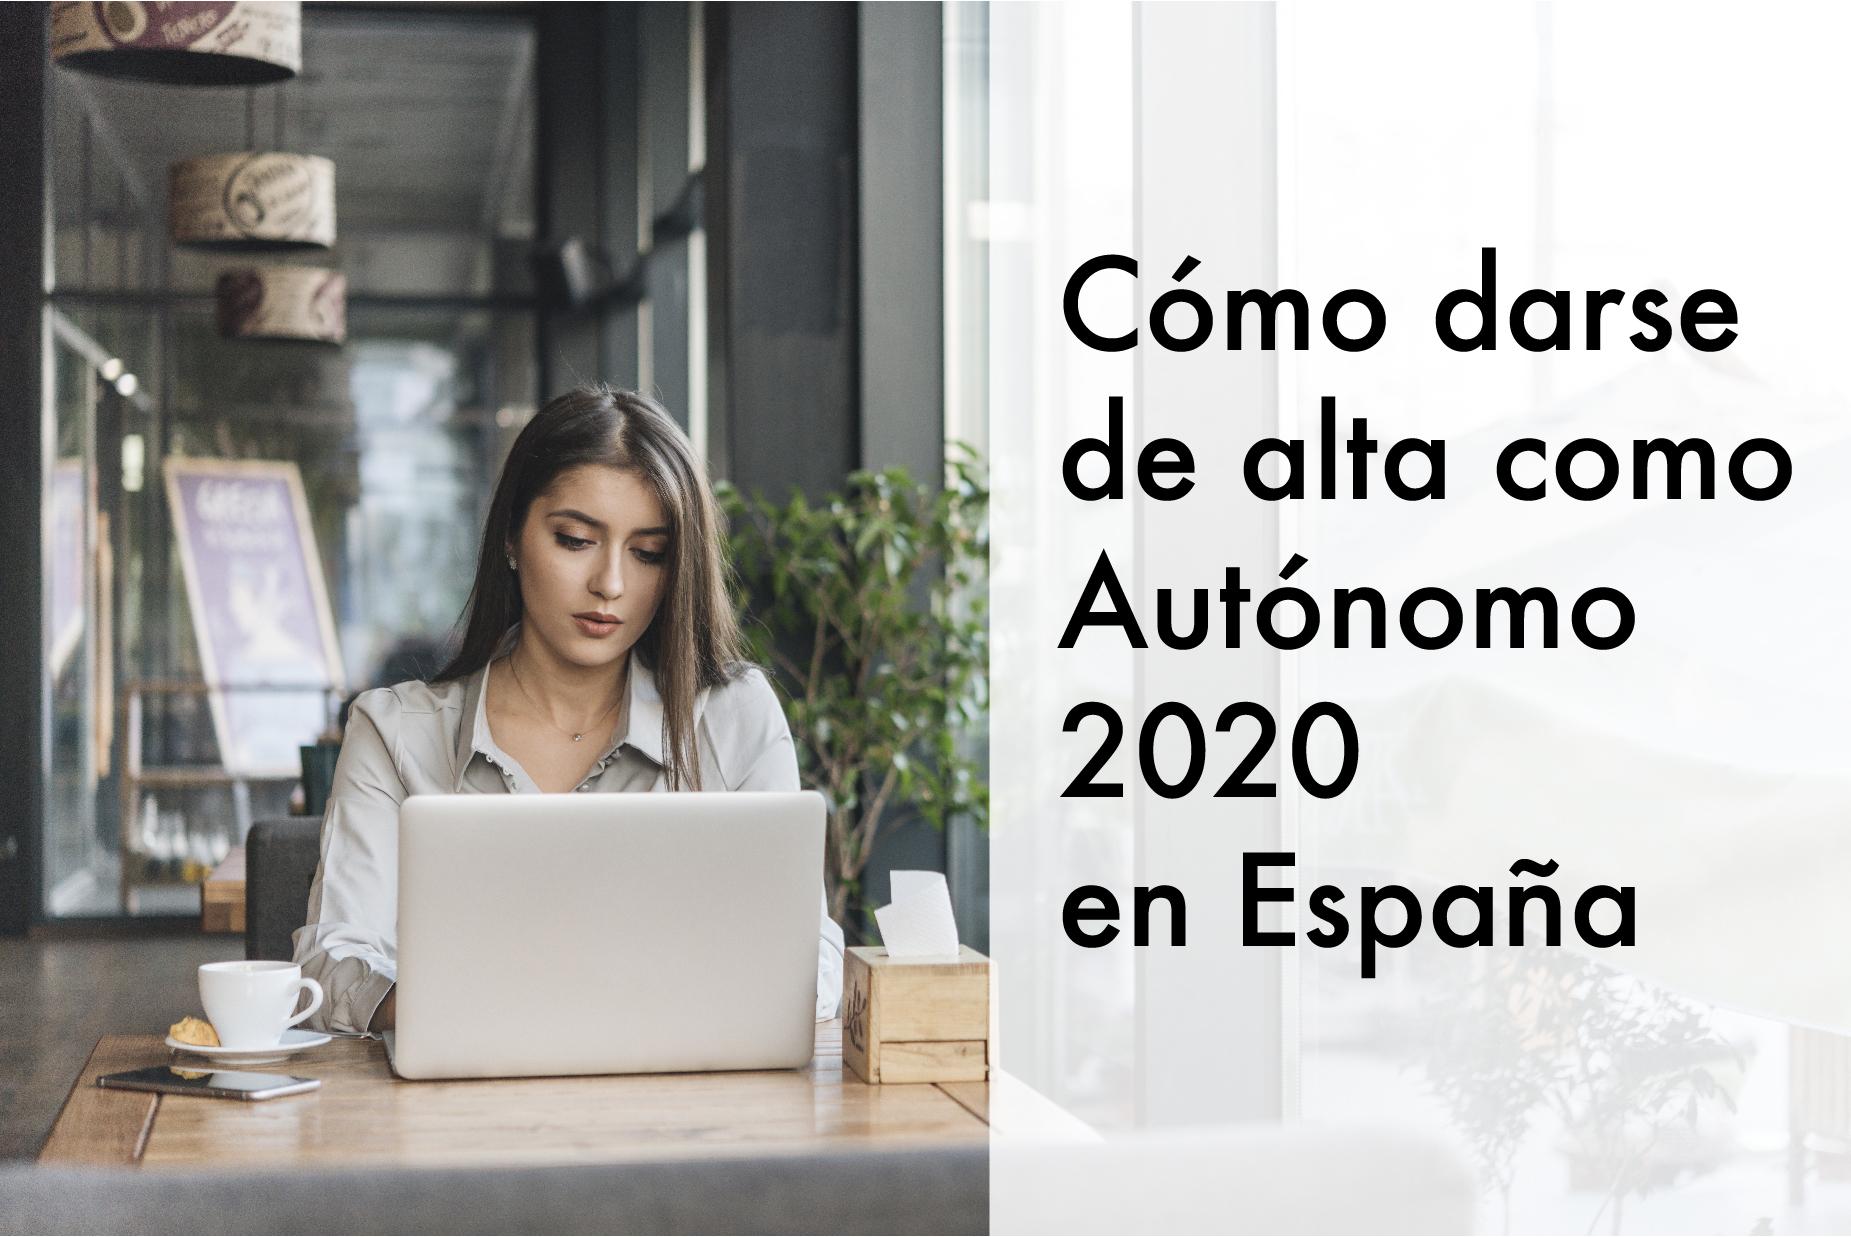 Cómo darse de alta como autónomo 2020 España